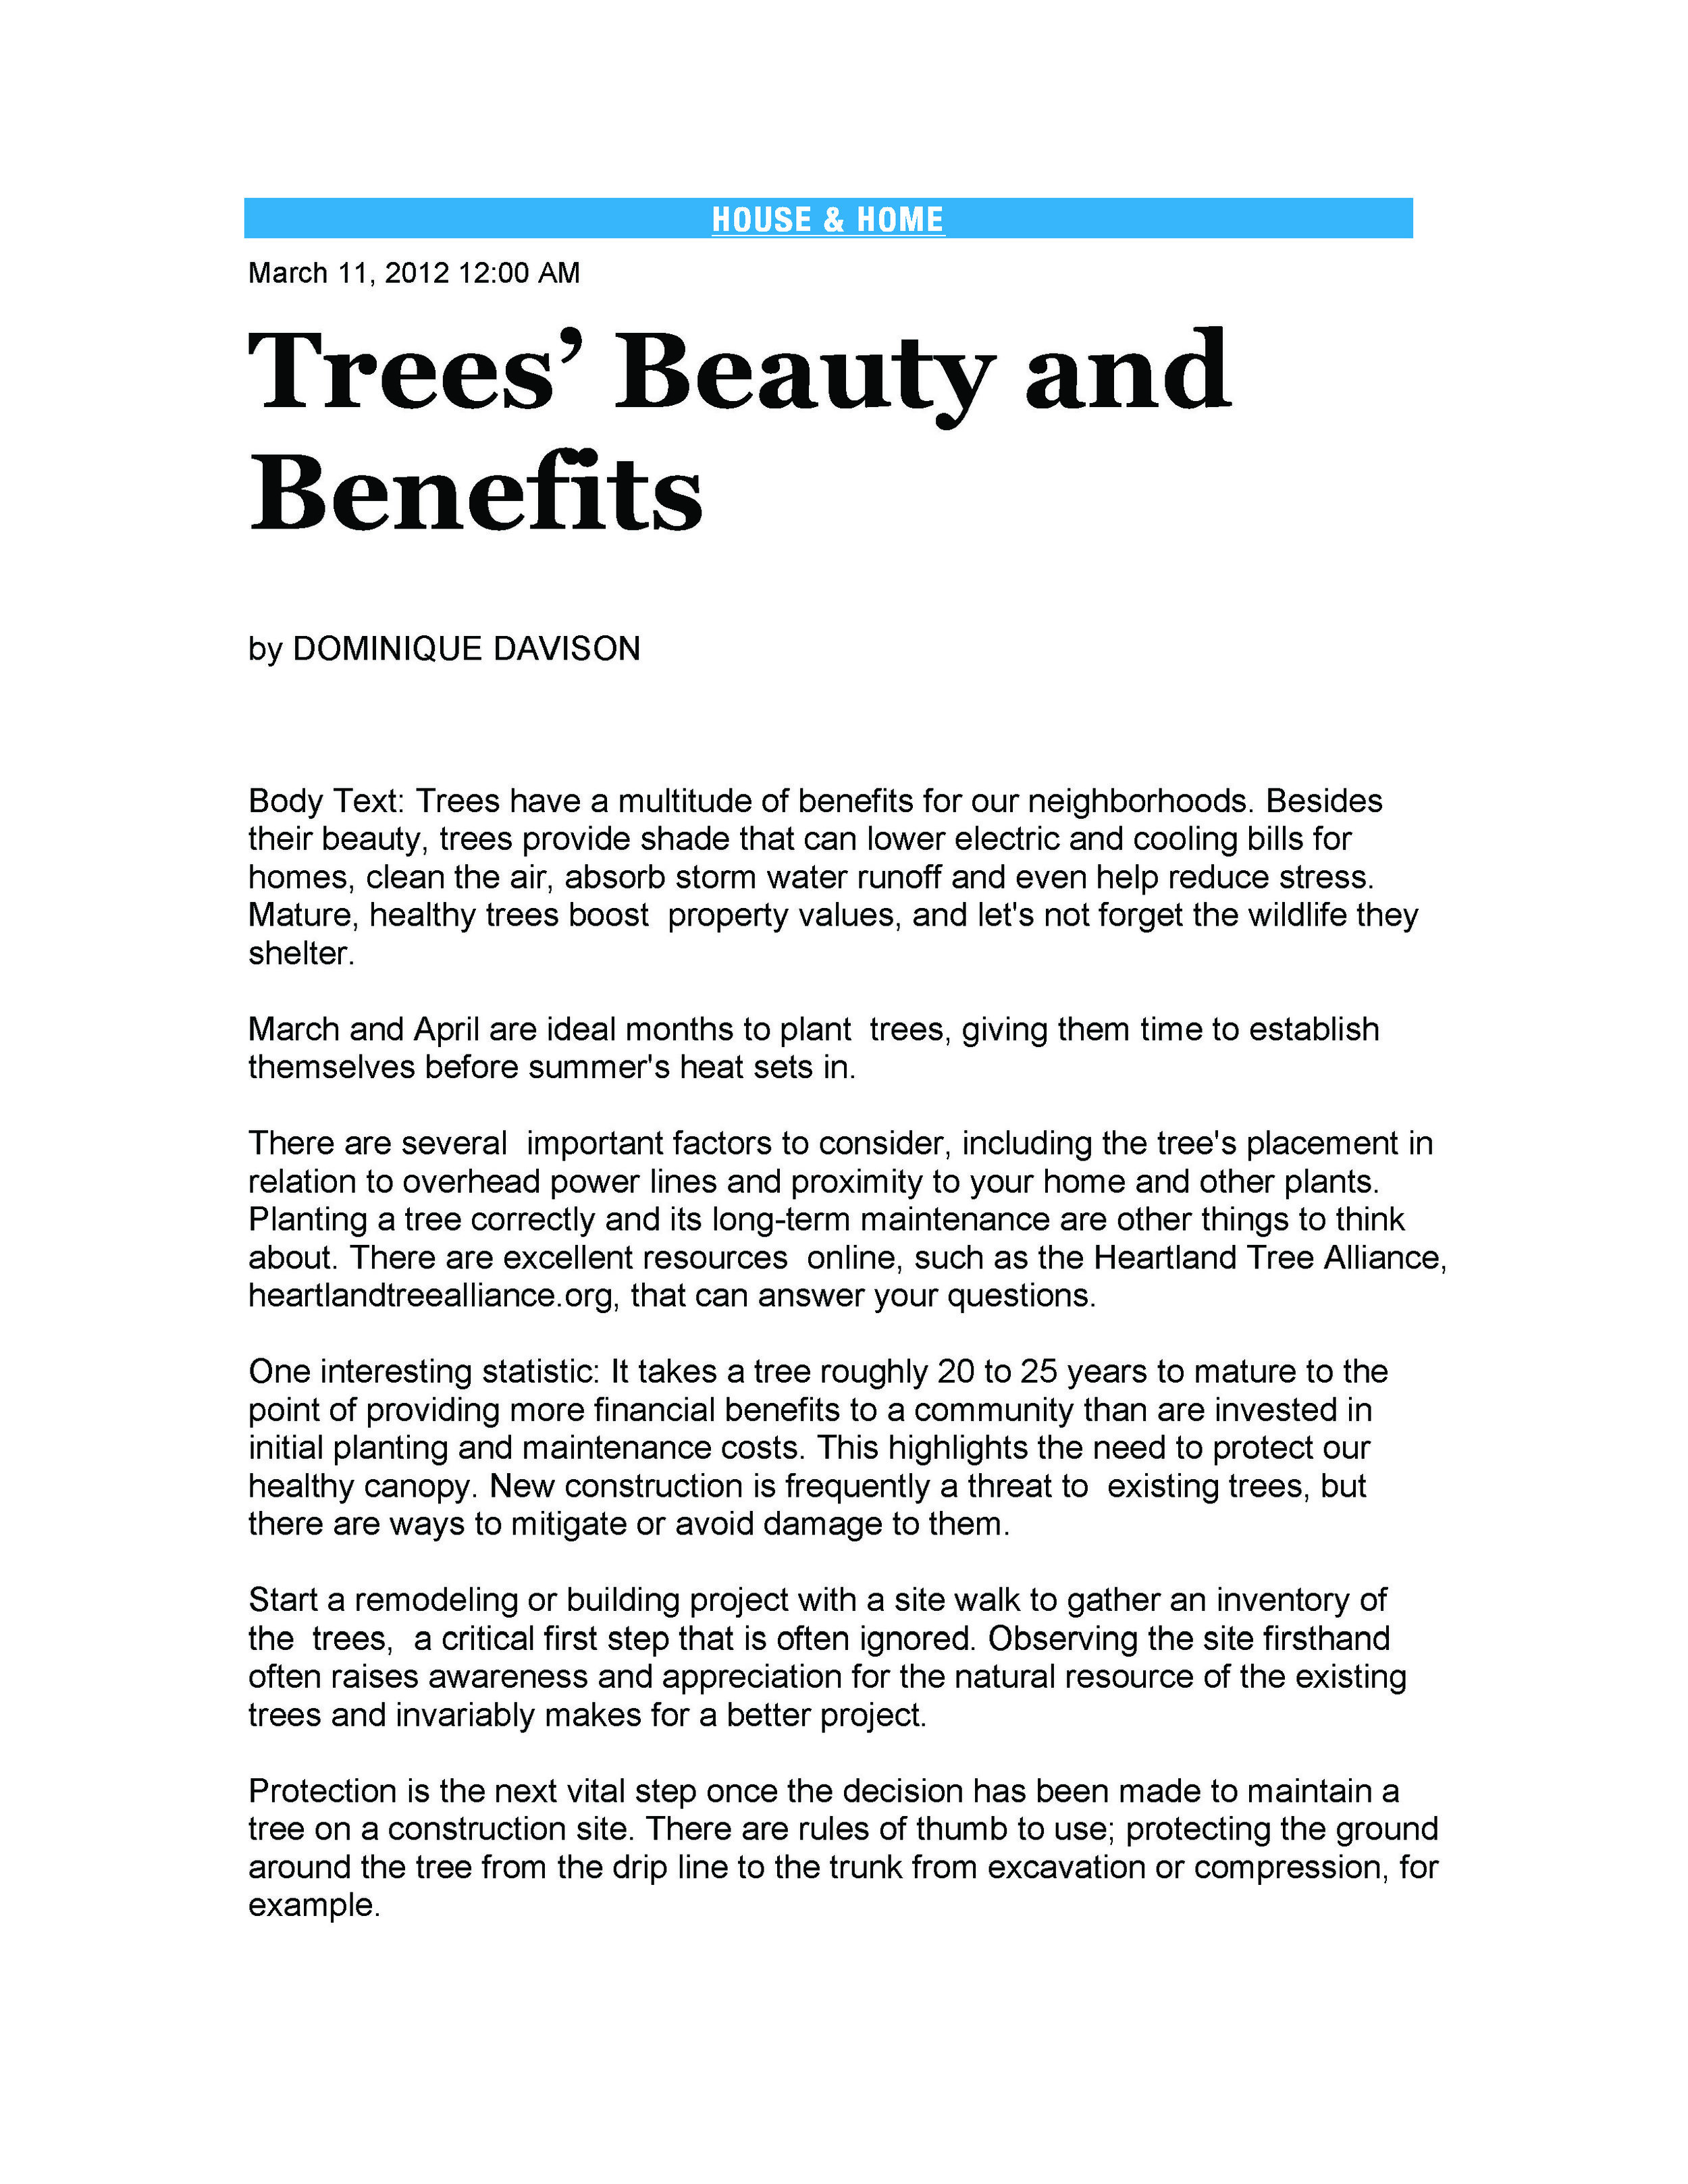 KCStar_2012_Trees_DominiqueDavison_Page_1.jpg